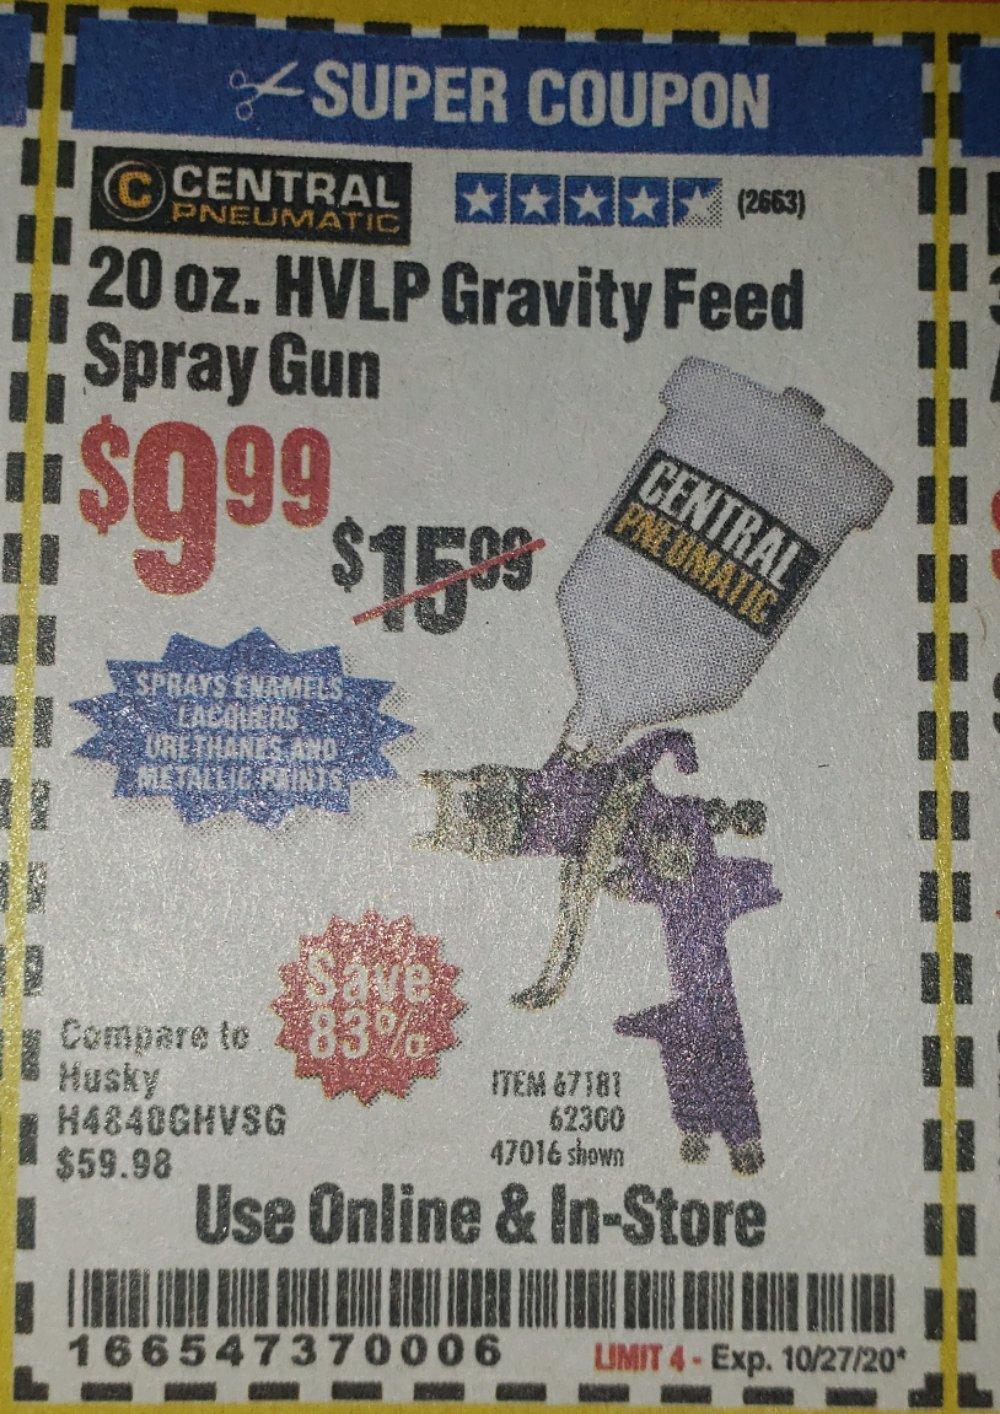 Harbor Freight Coupon, HF Coupons - 20 Oz. Gravity Feed Spray Gun